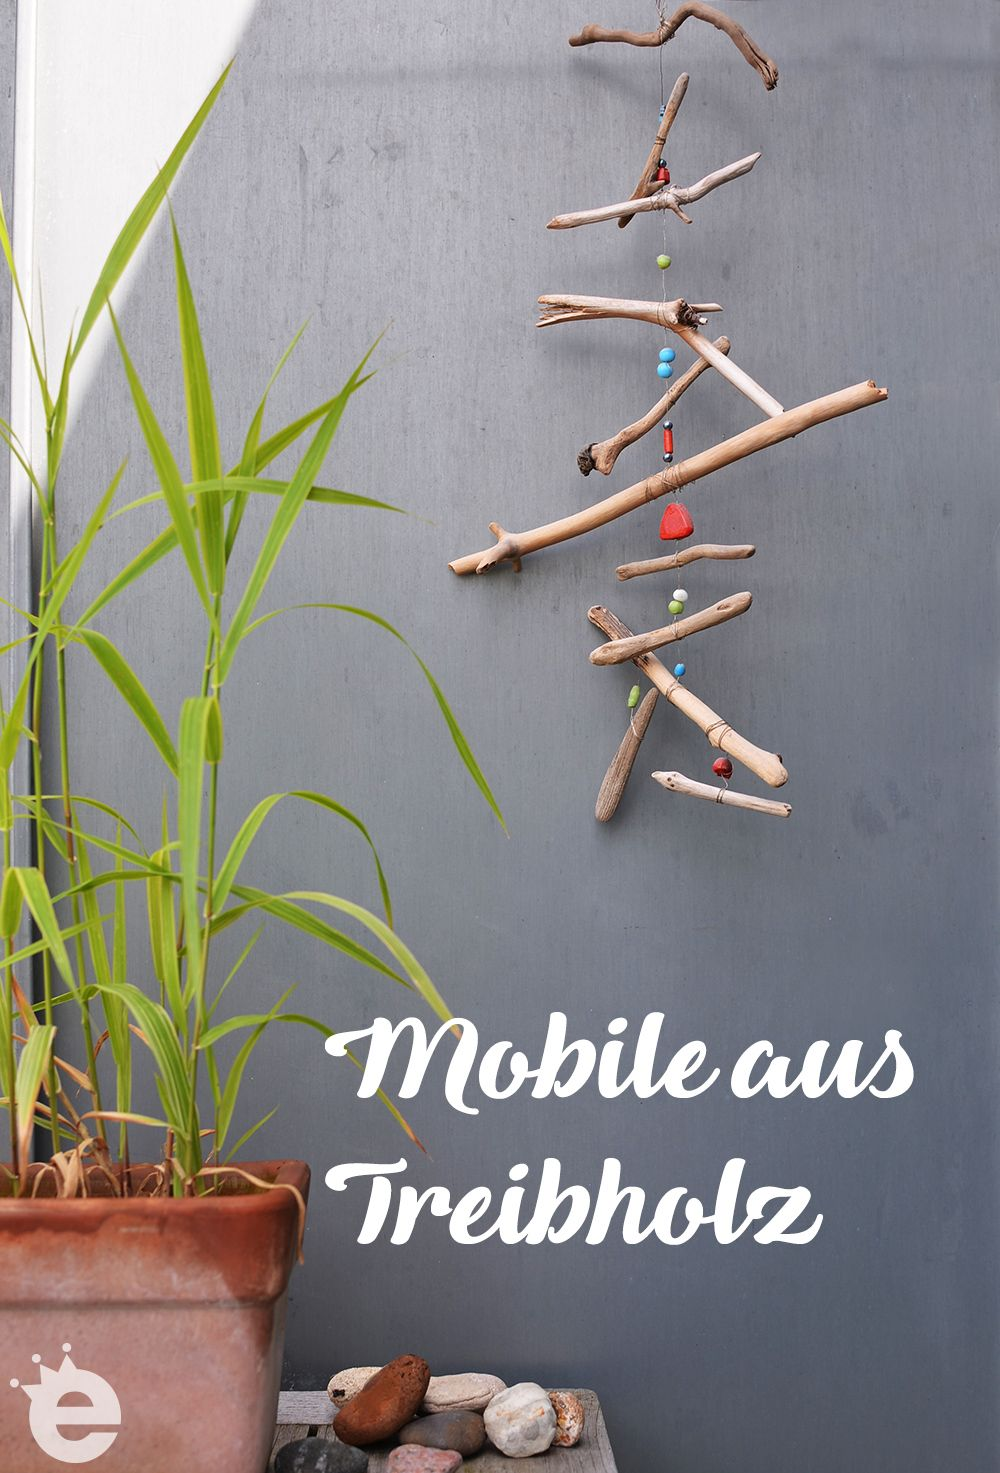 Mobile Basteln Mit Treibholz Aus Bornholm Diy Mobile Basteln